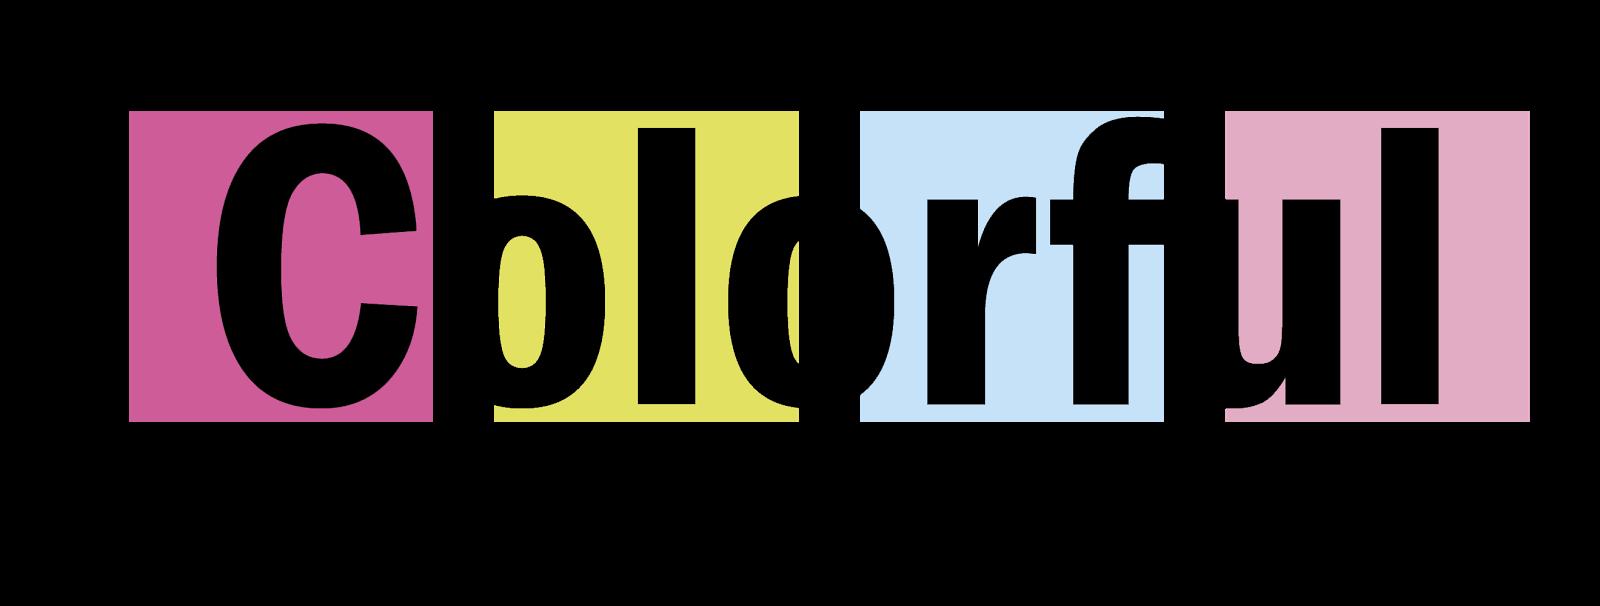 http://www.colorfulmedia.pl/